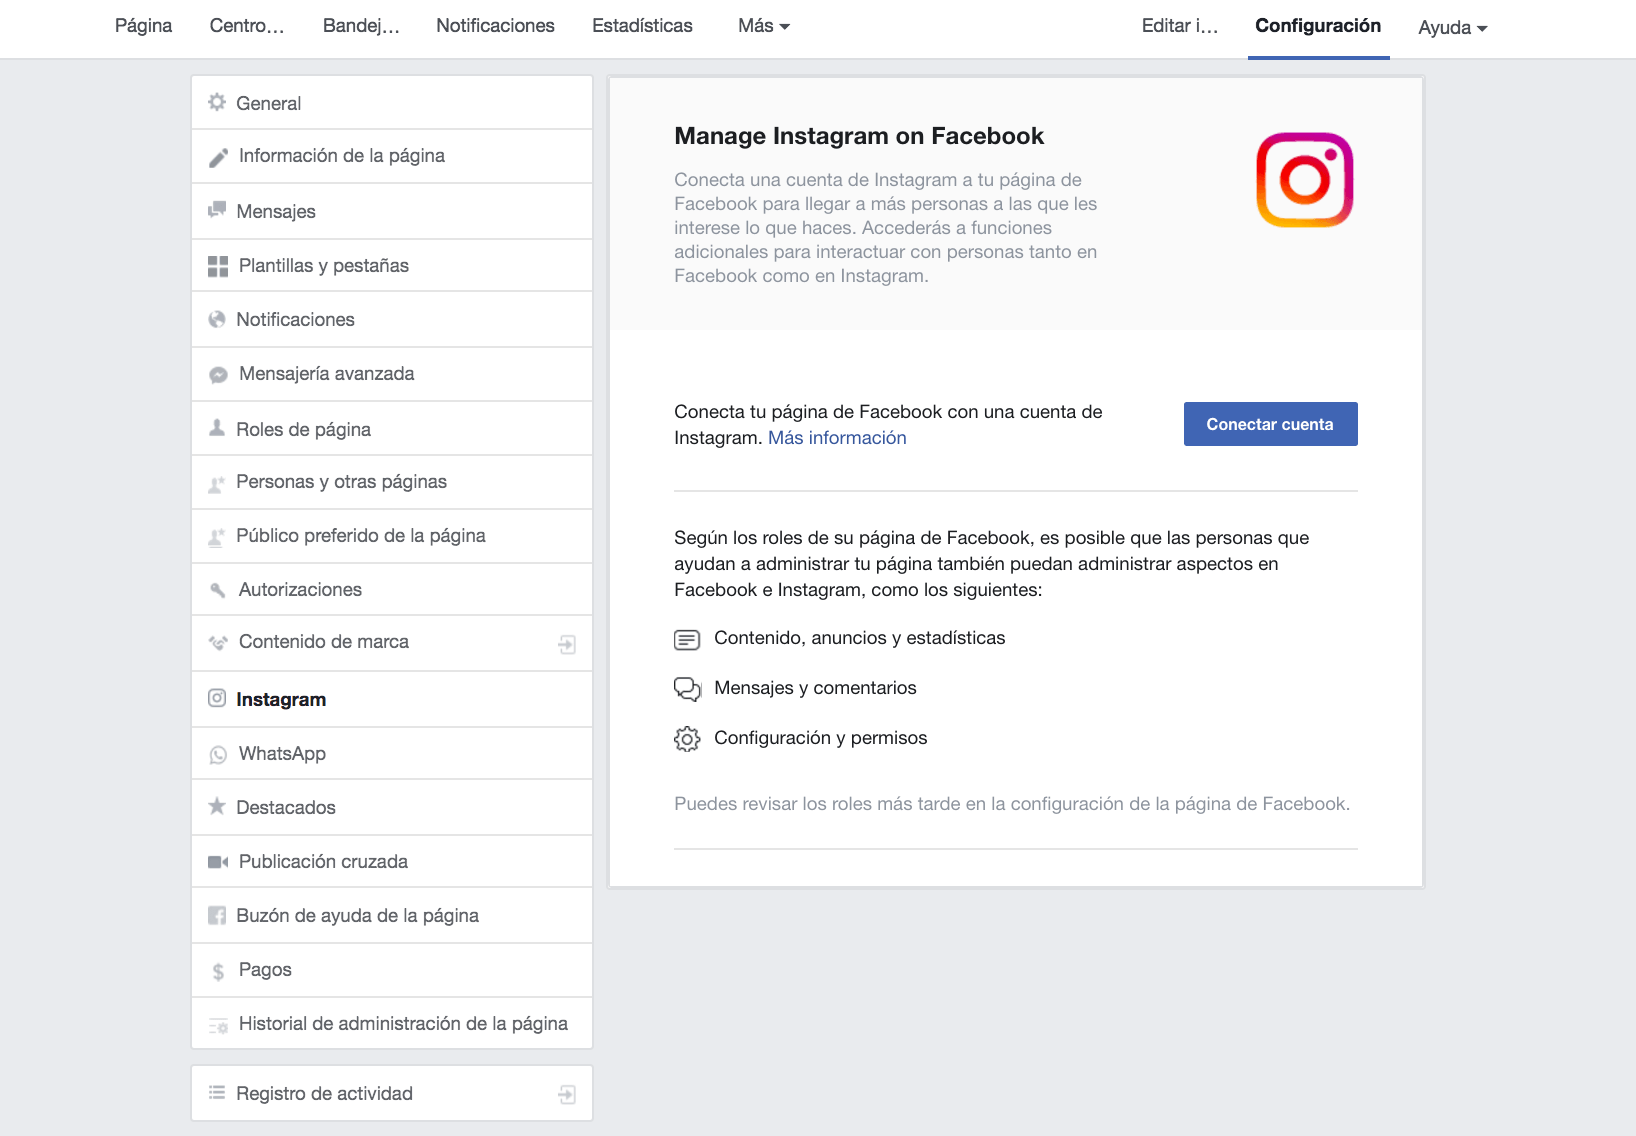 vincular cuenta instagram a pagina facebook